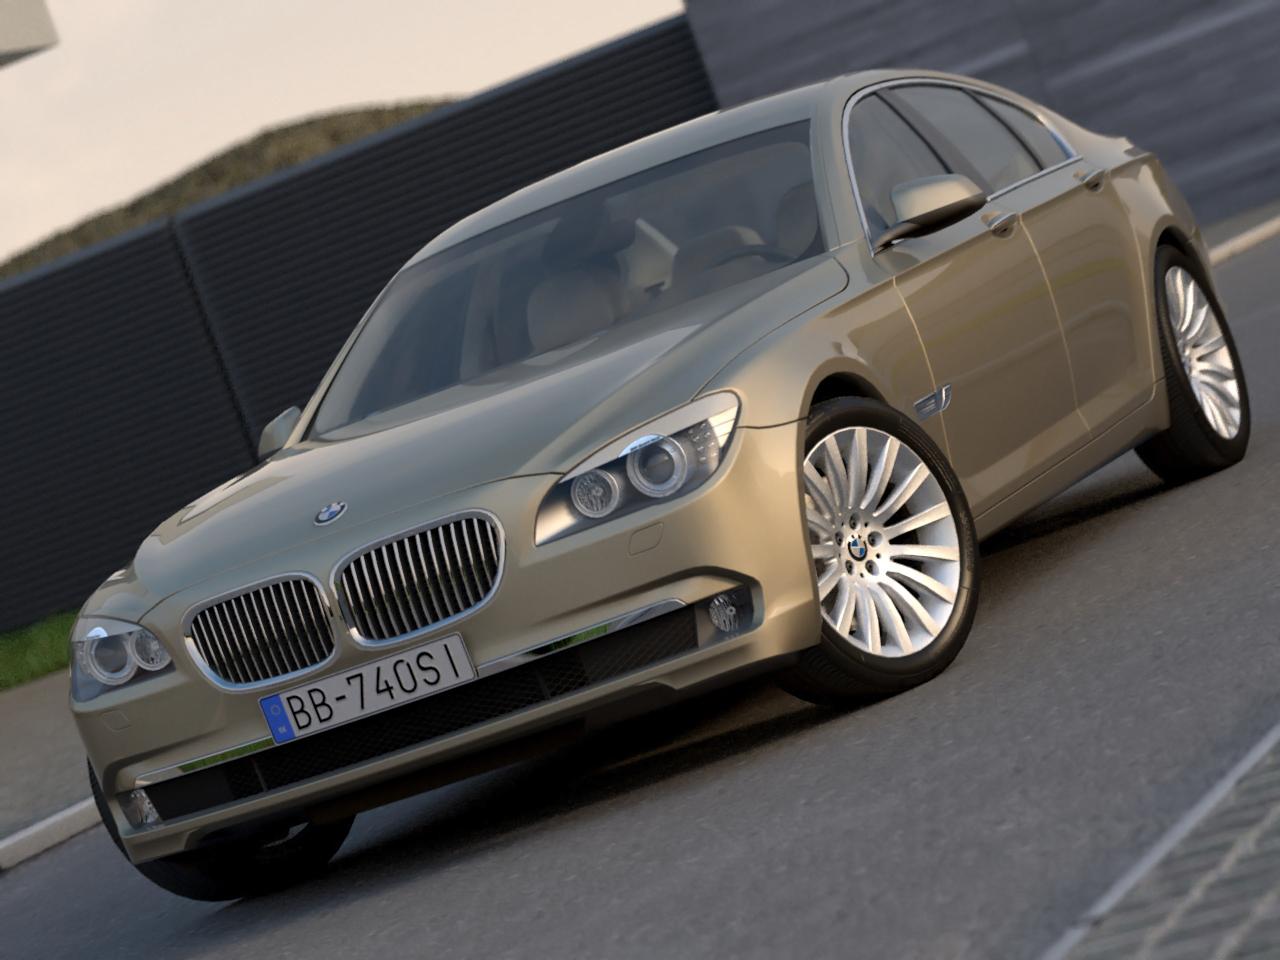 BMW 7 series (2009) 3d model 3ds max fbx c4d obj 189385